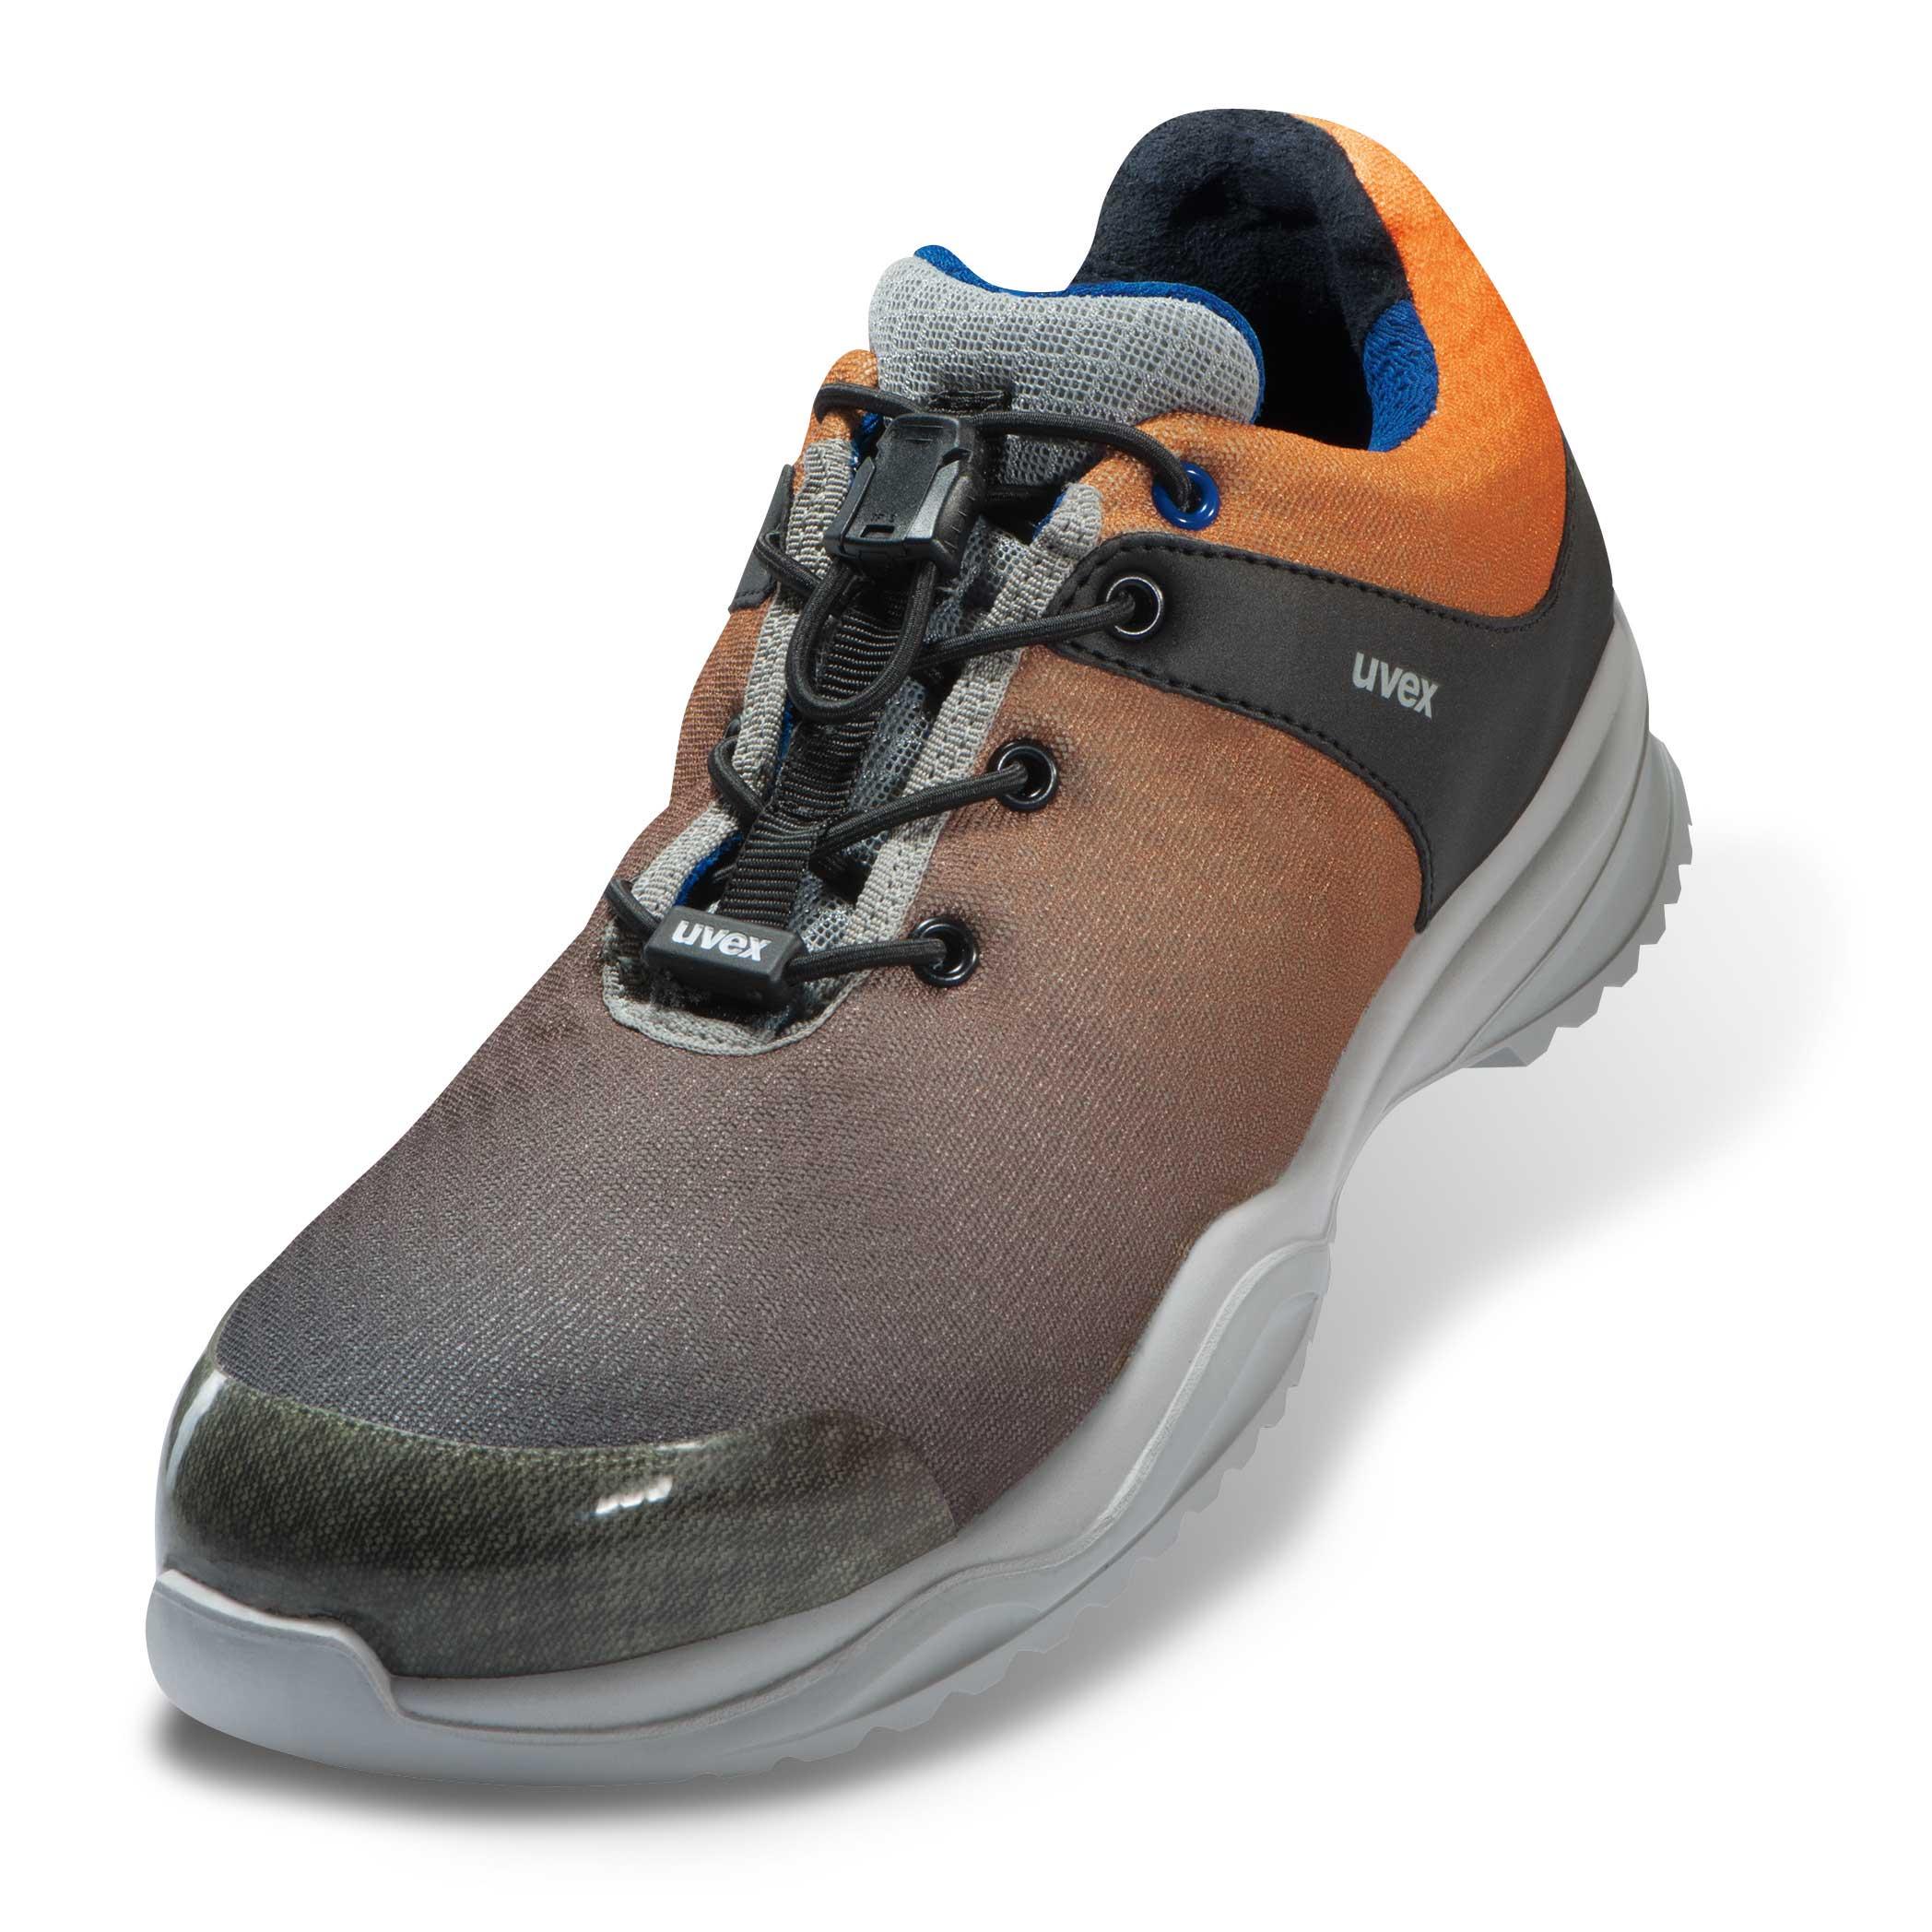 uvex src shoe s1 sportsline safety shoes